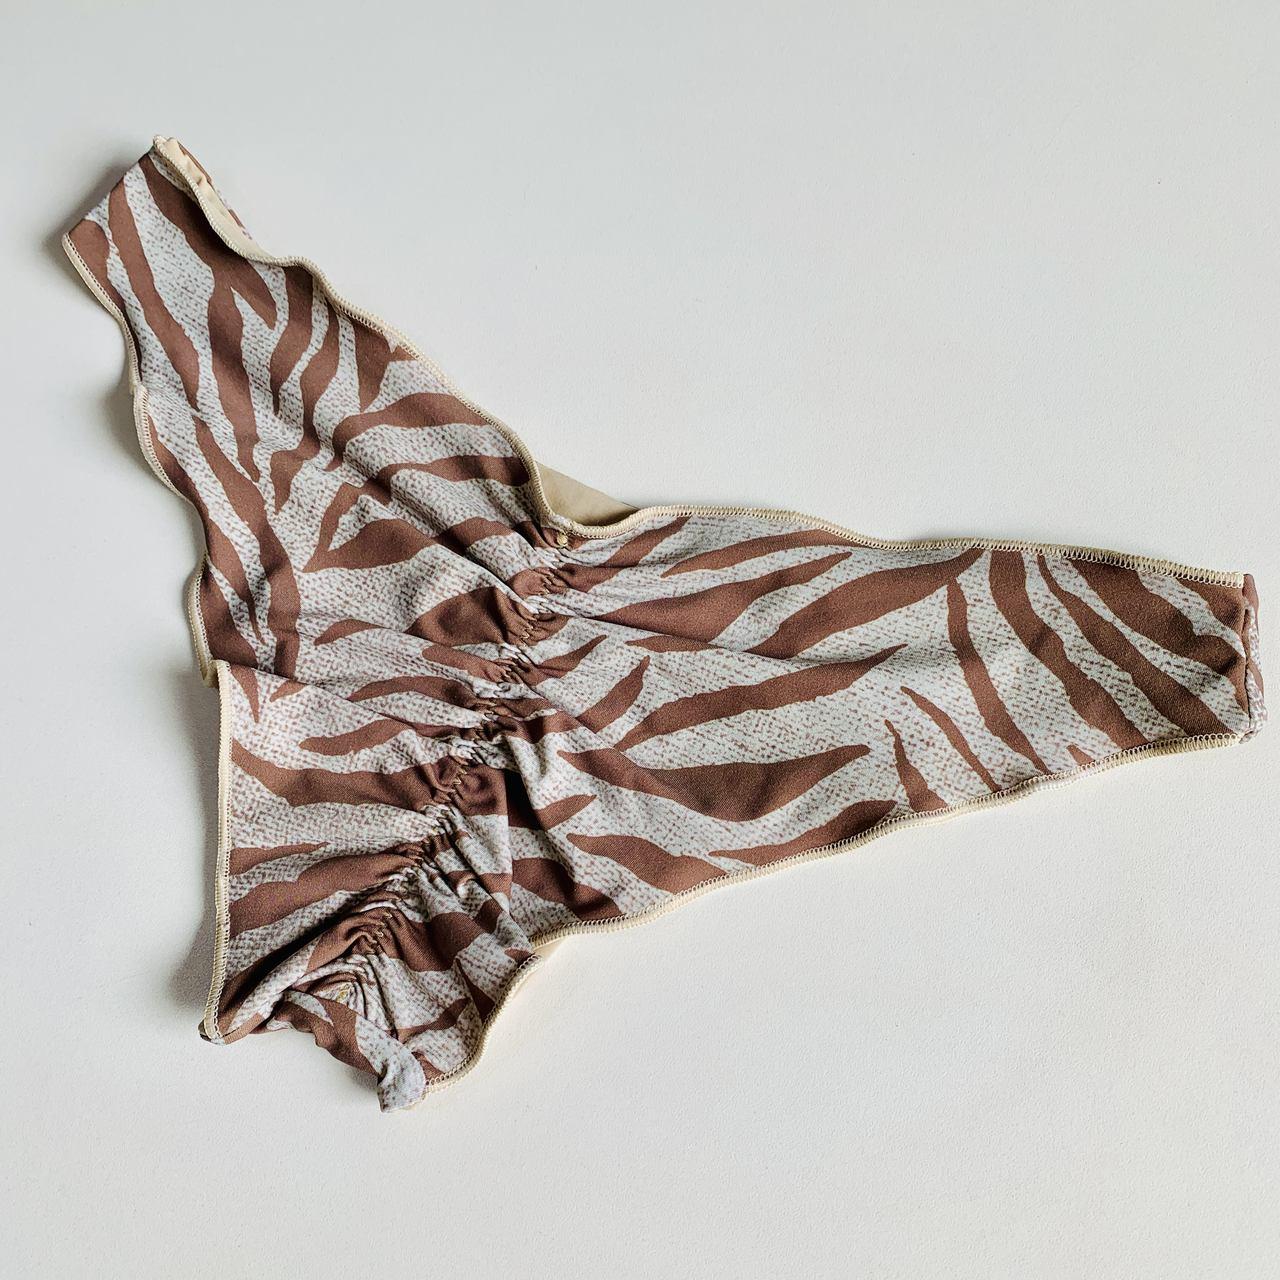 Biquíni Calcinha Lili Ondulada Ripple Zebra Nude